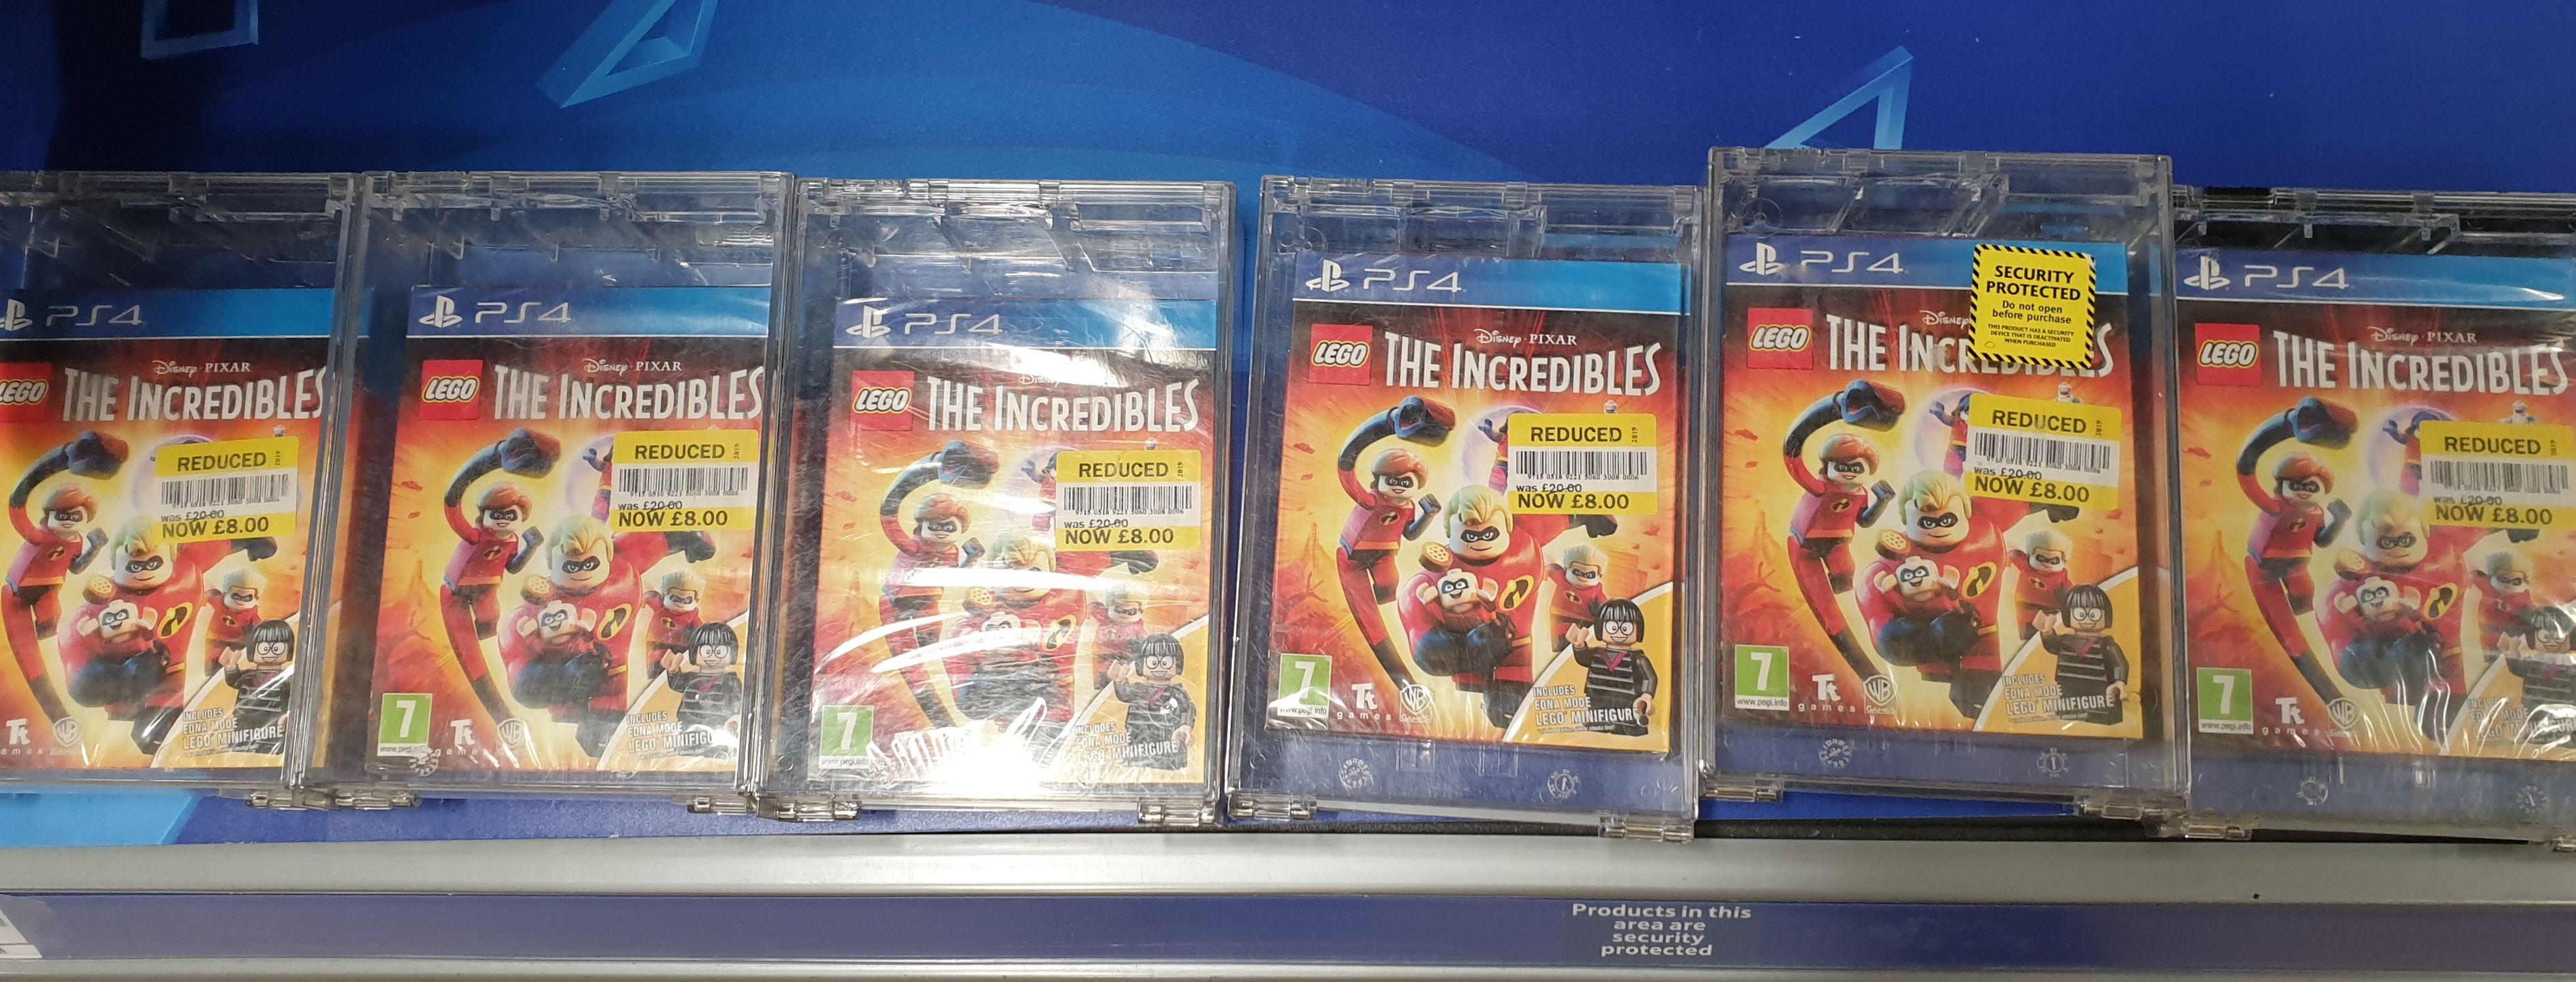 Lego: The Incredibles - PS4 - £8 at Tesco Extra Altrincham